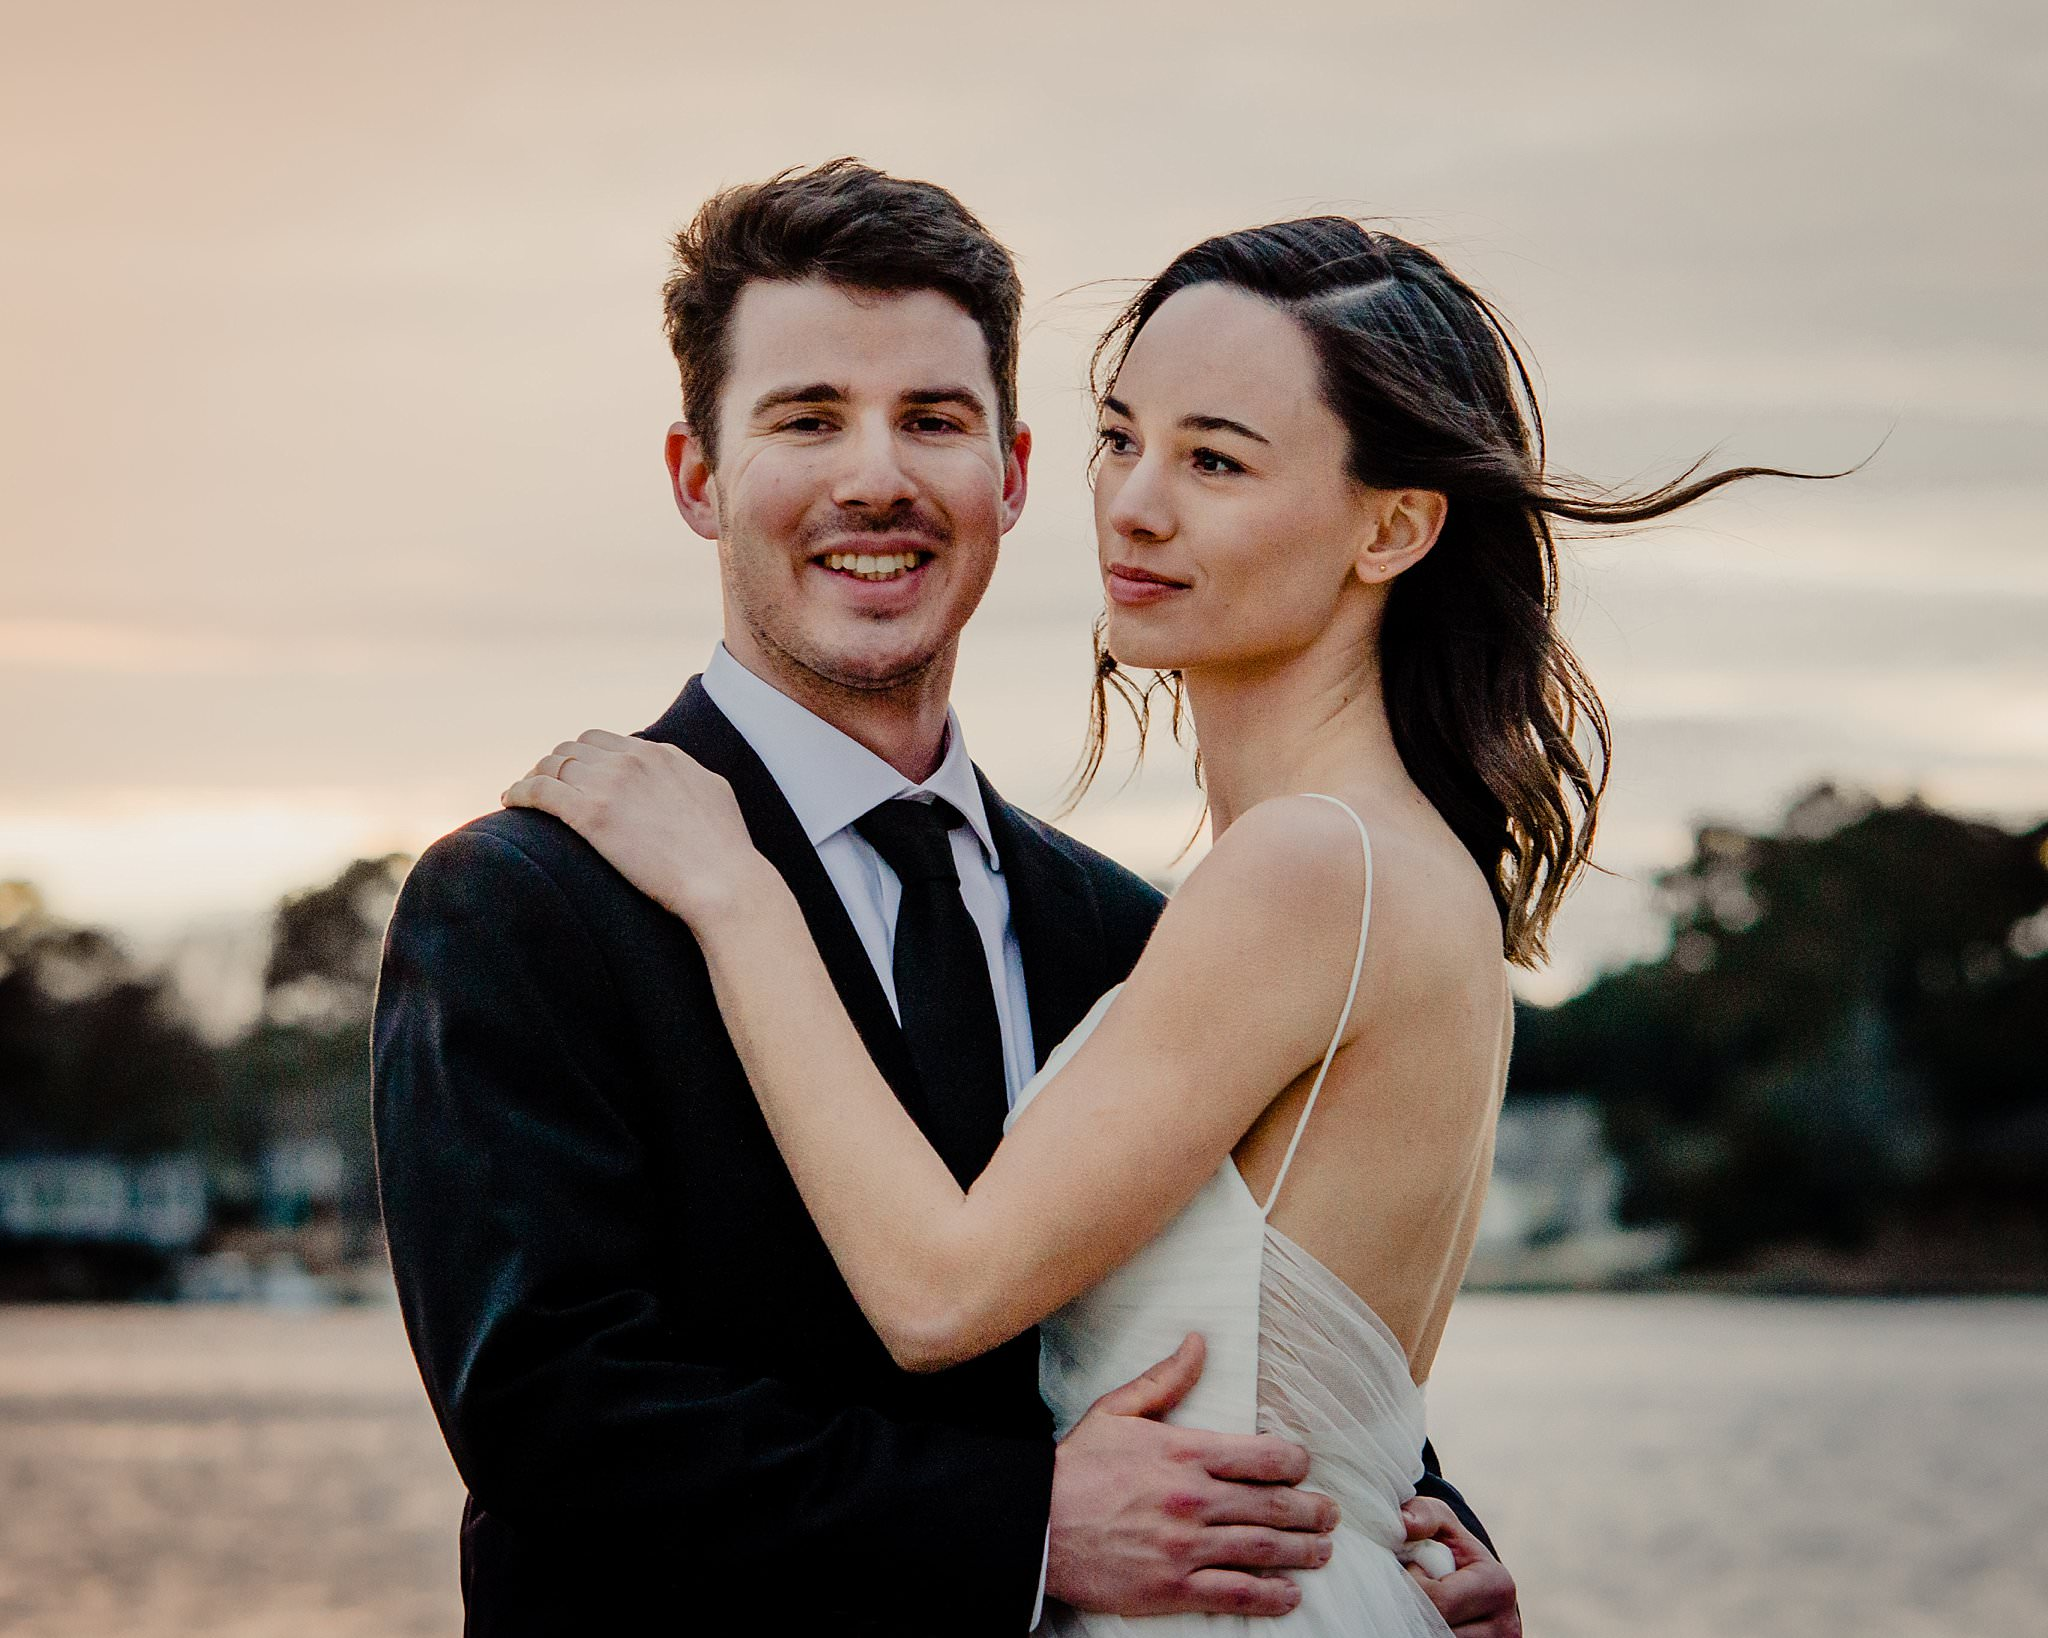 beach-wedding-photos-award-winning-wedding-photography-VA-wedding-photographer-melissa-bliss-photography.jpg